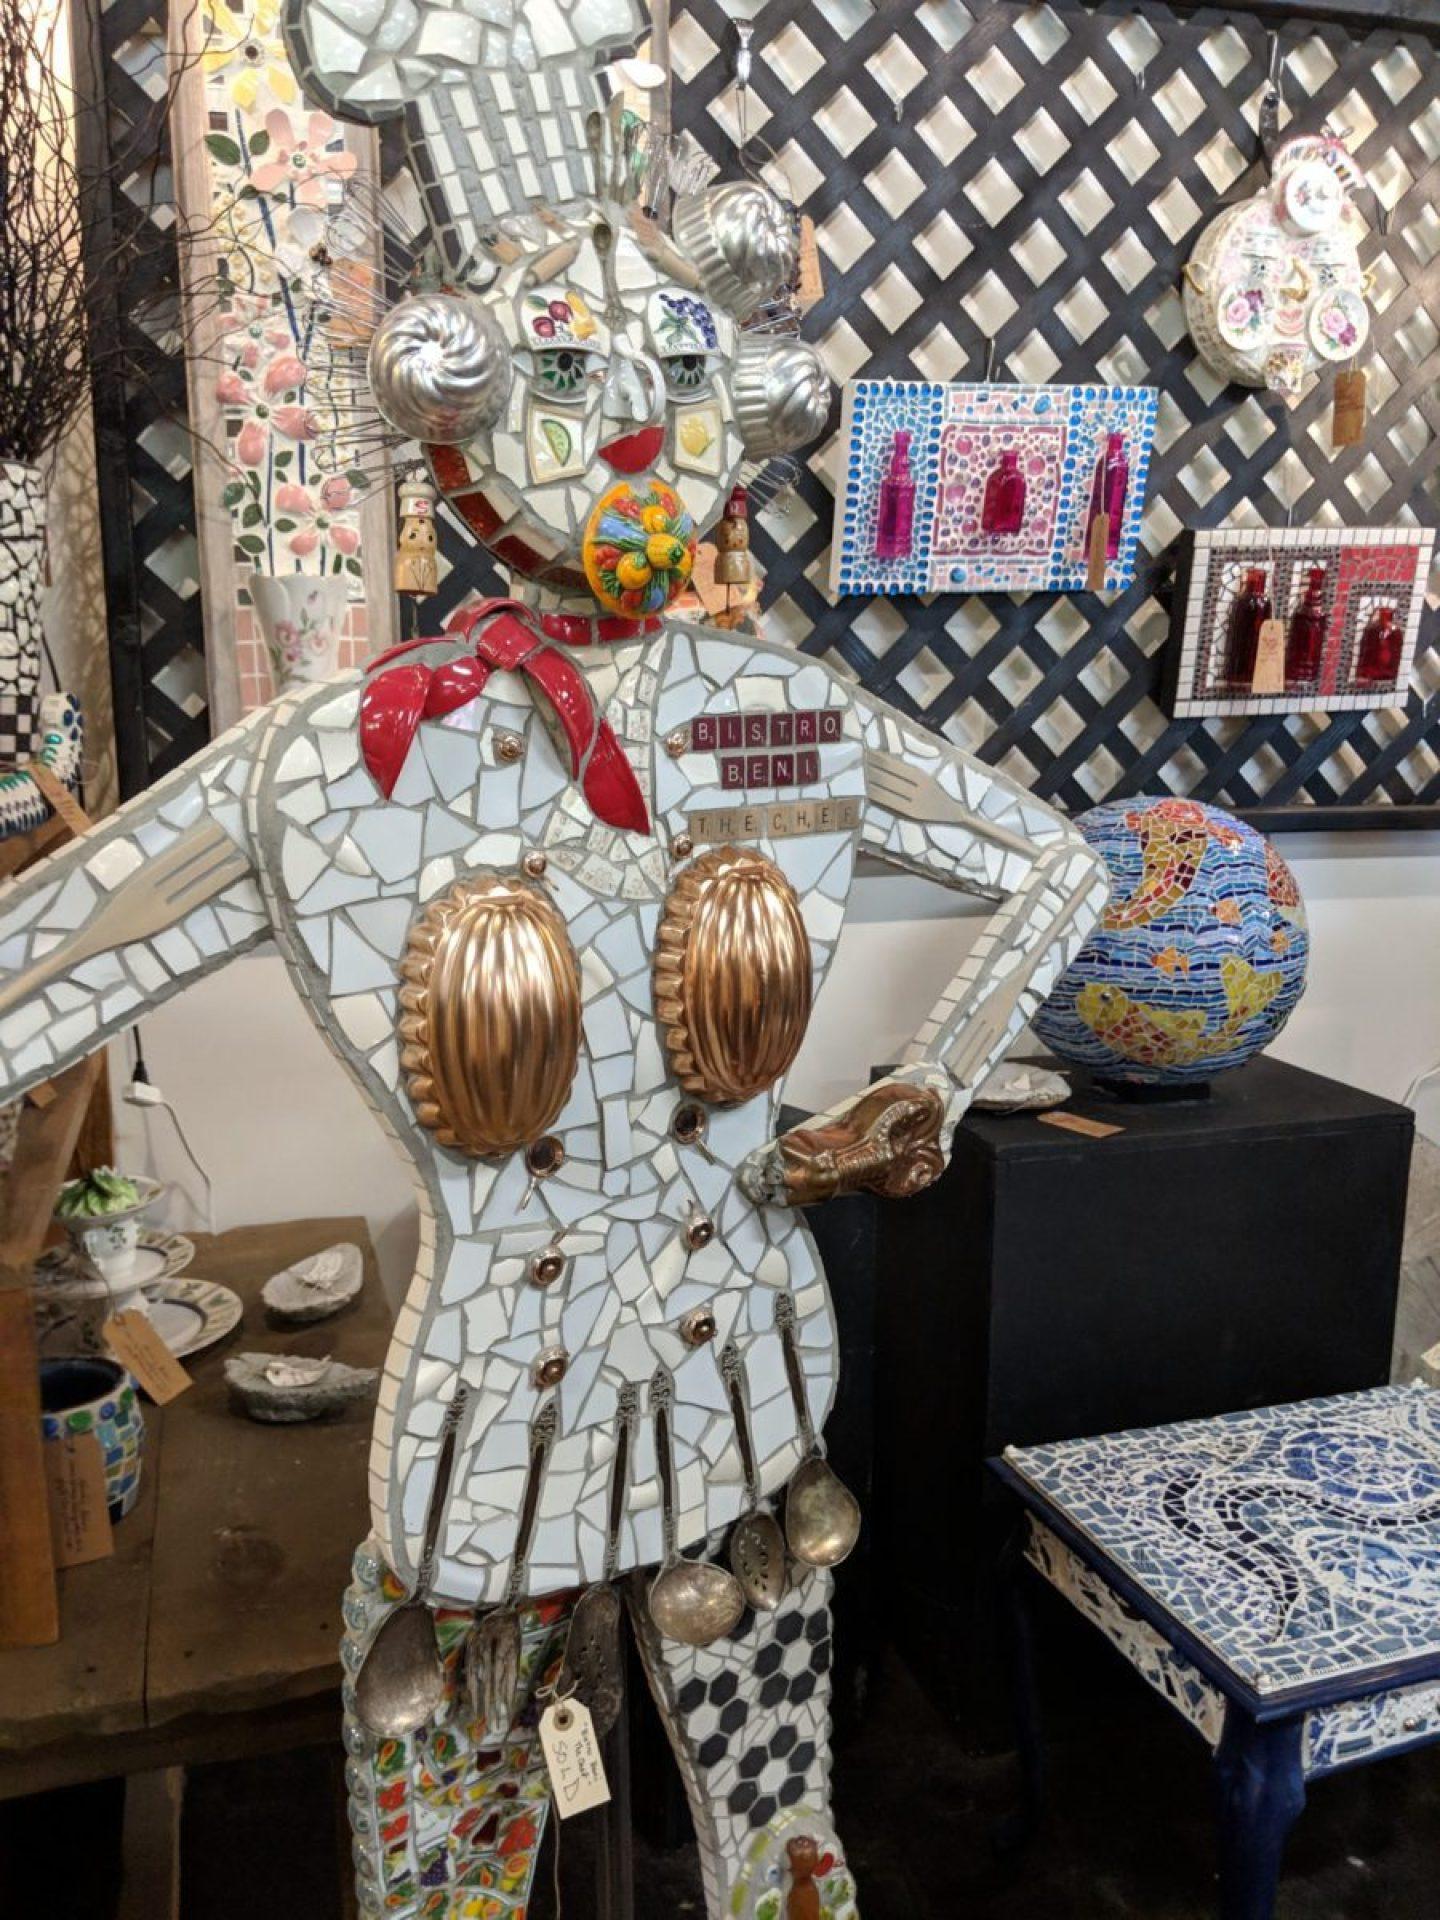 IMG_20190505_144629-1440x1920 Arkansas Delta Family Road Trip:  Black Heritage, Art & More!